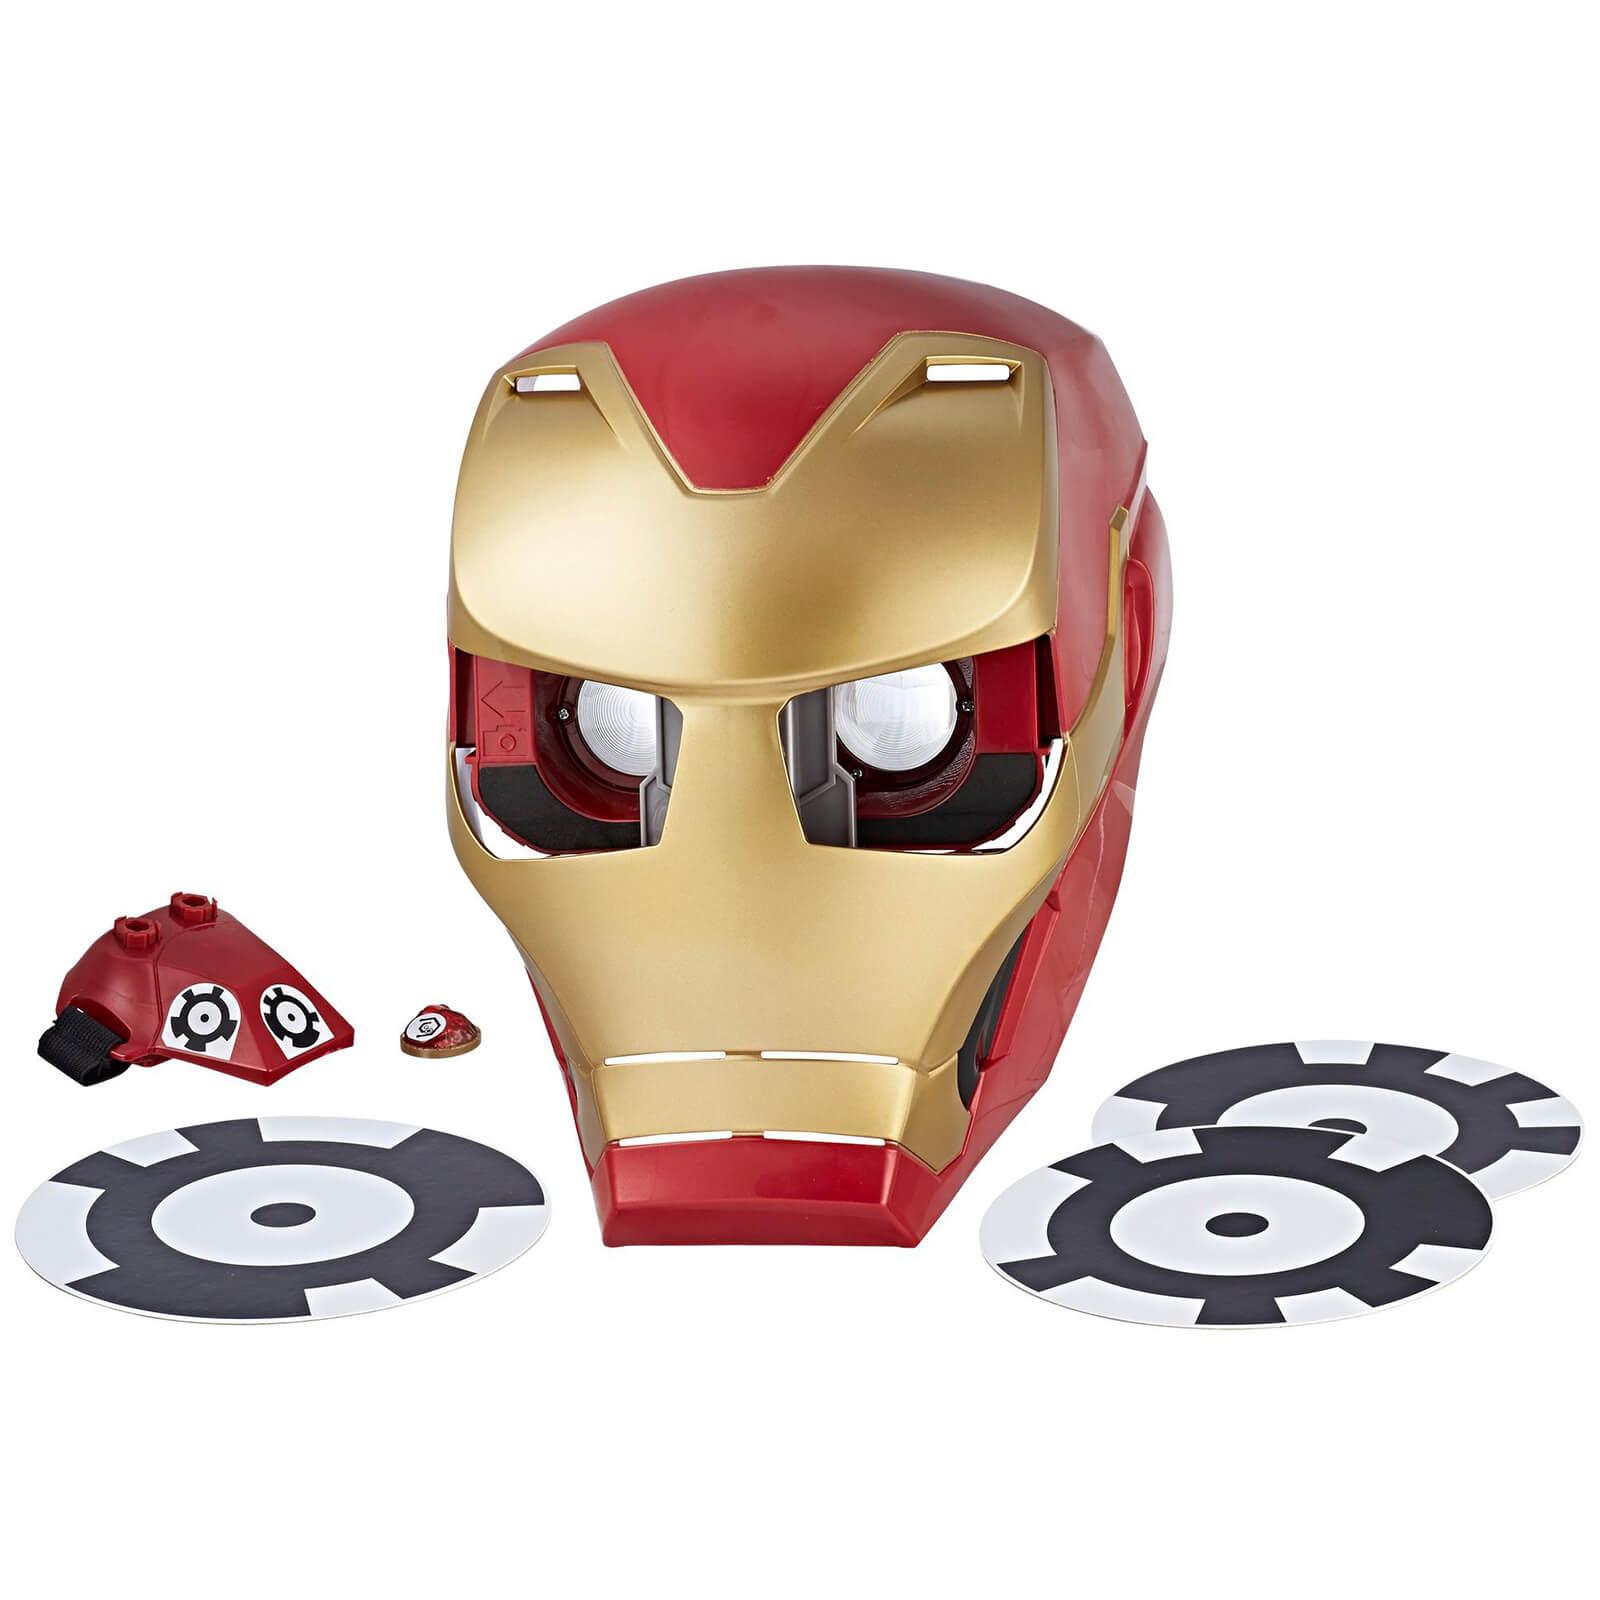 Marvel Avengers Infinity War Hero Vision AR Iron Man Mask £14.99 delivered @ Bargainmax